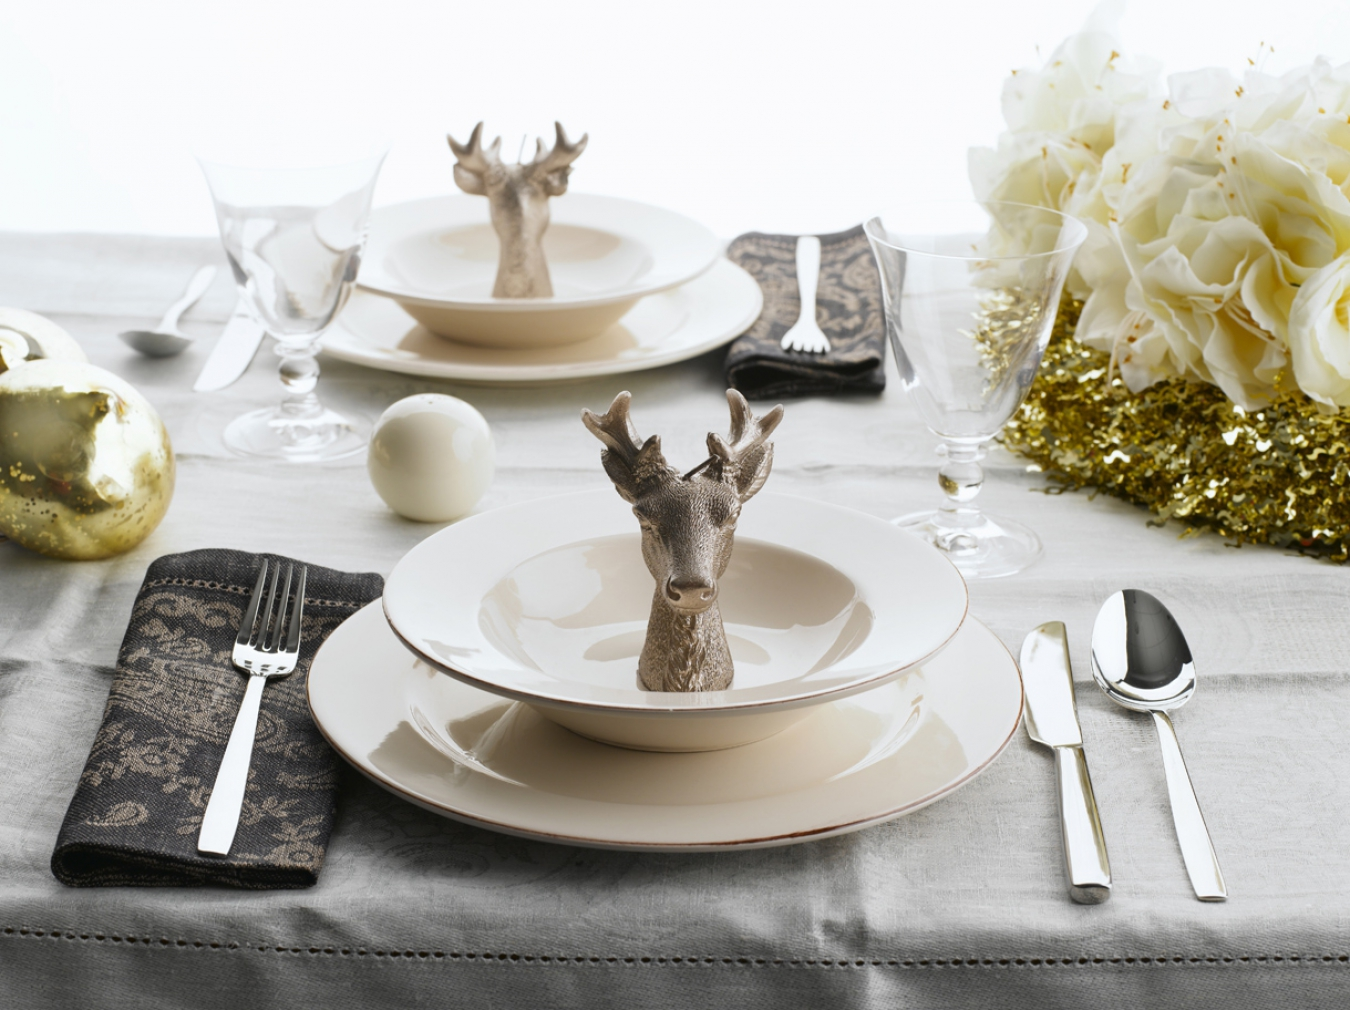 Сервировочная тарелка на столе